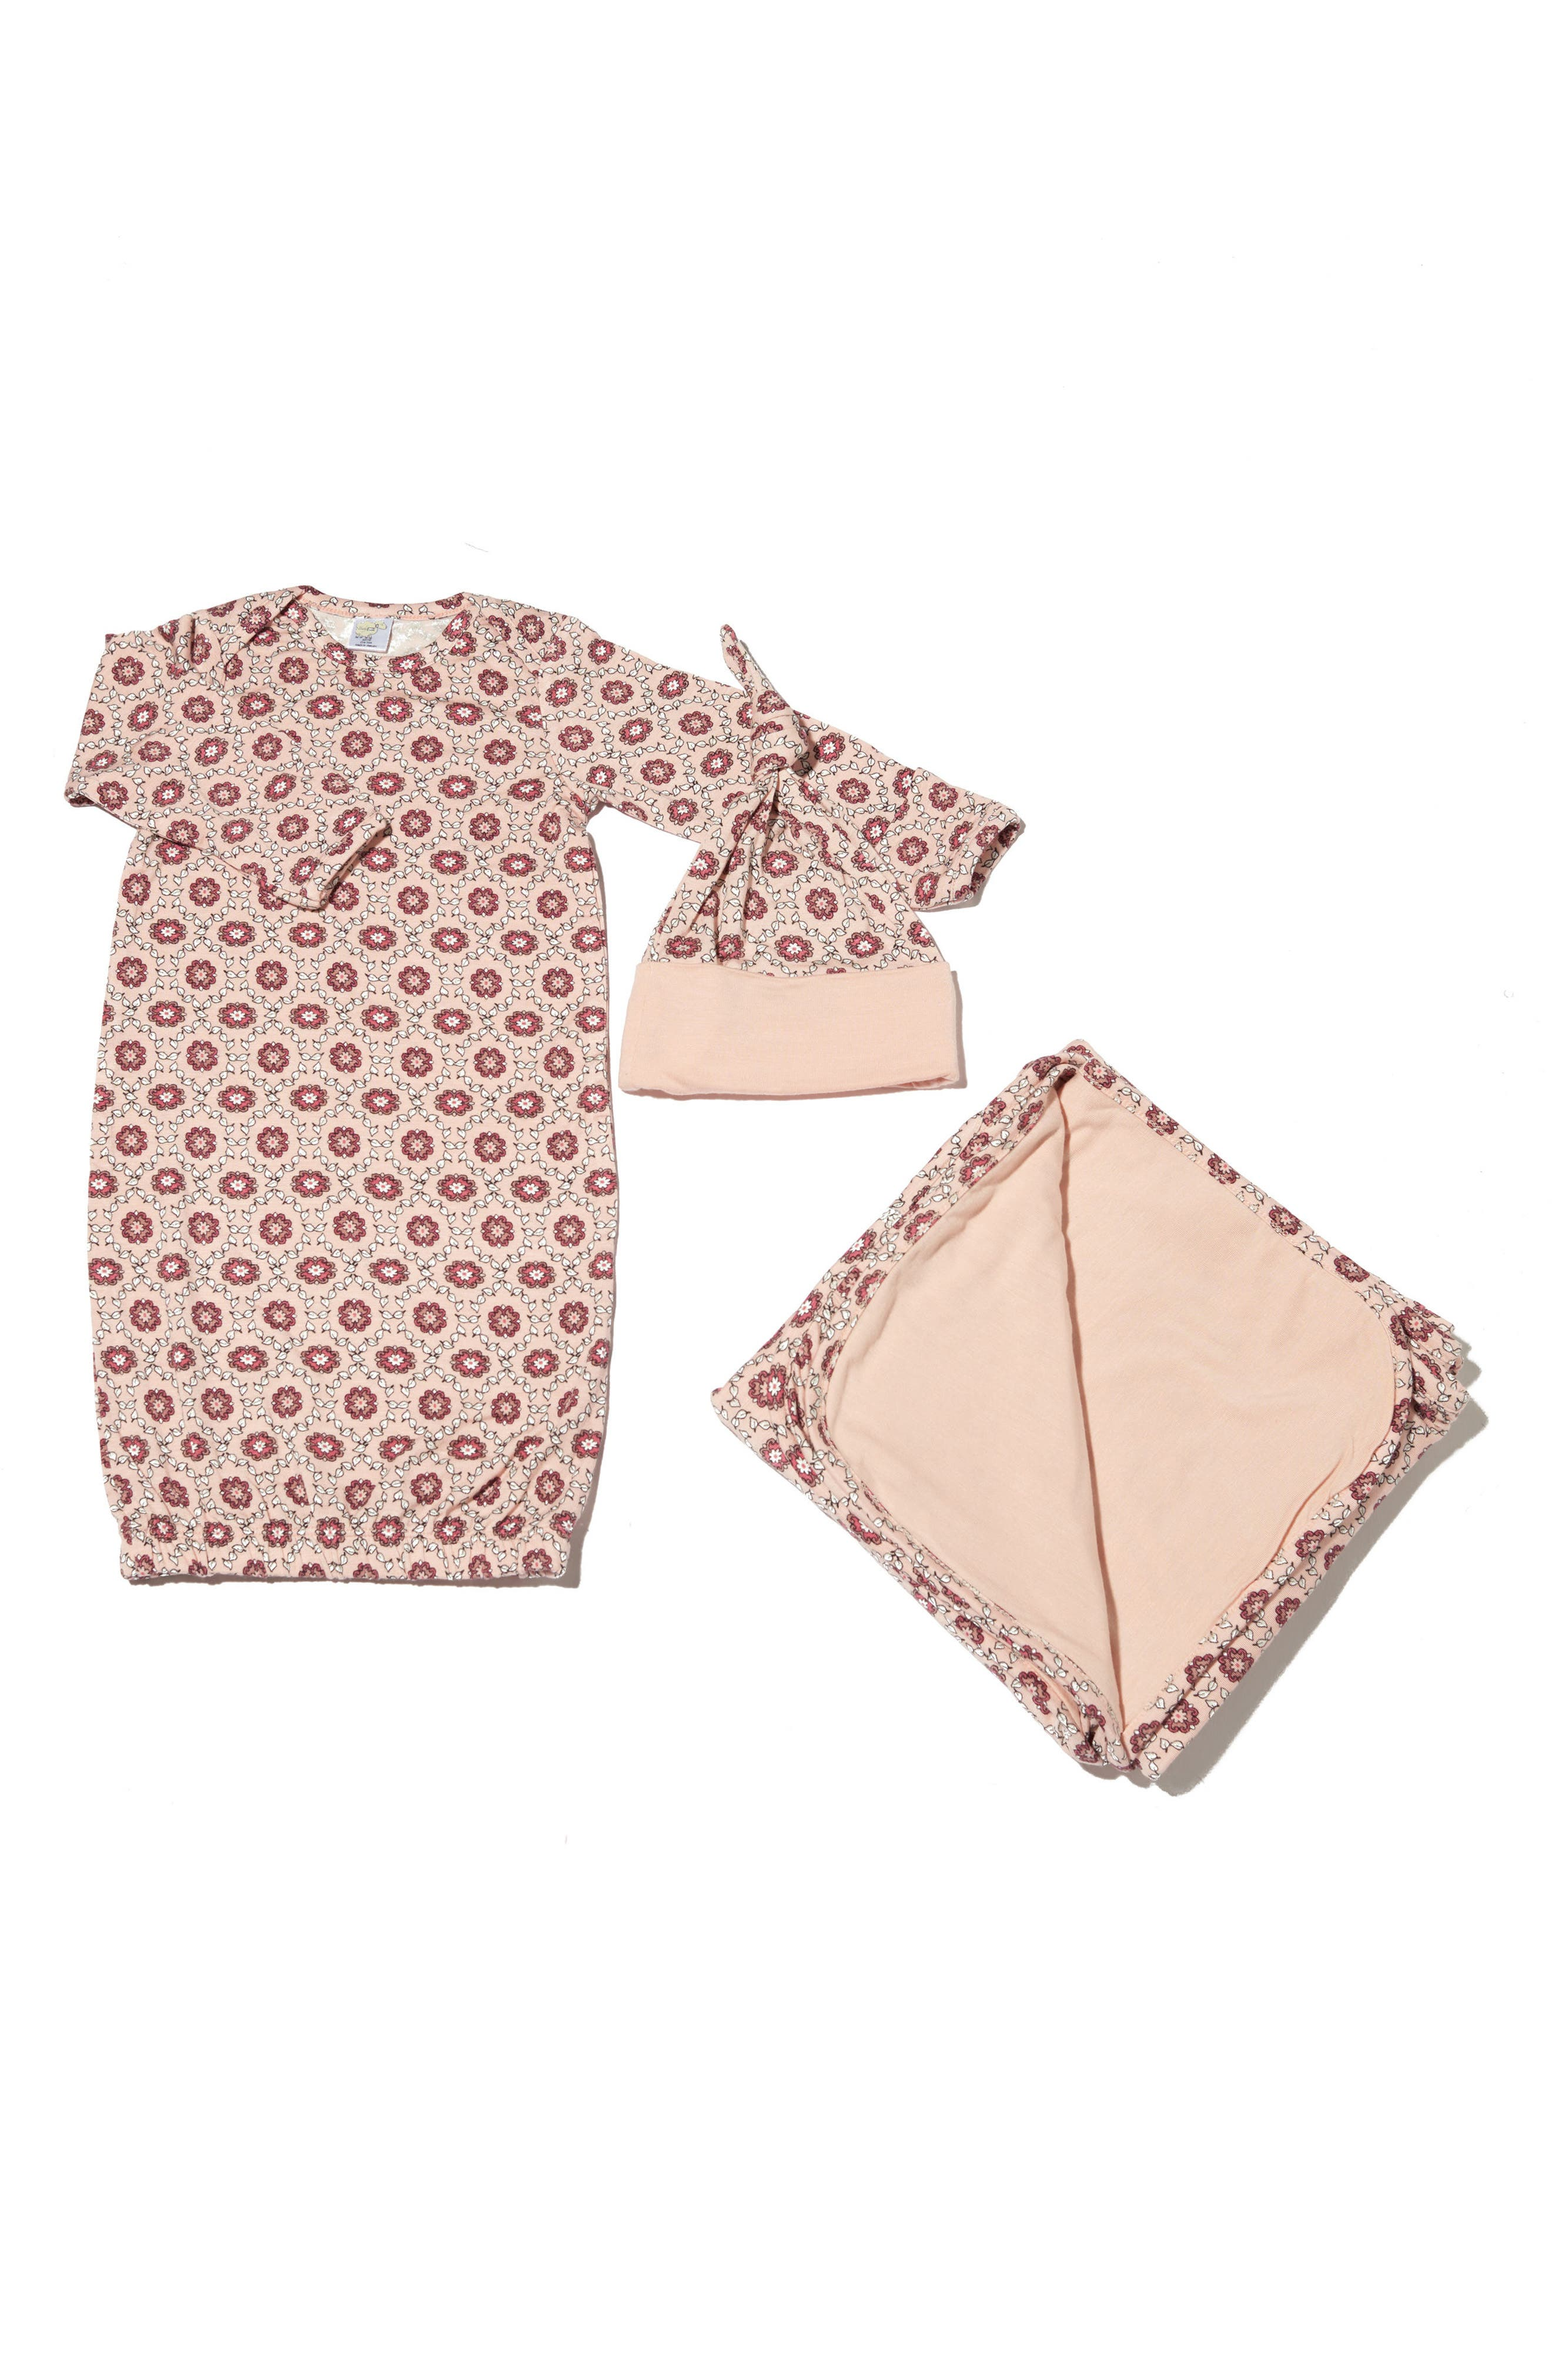 Print Gown, Hat & Blanket Set,                         Main,                         color, 660